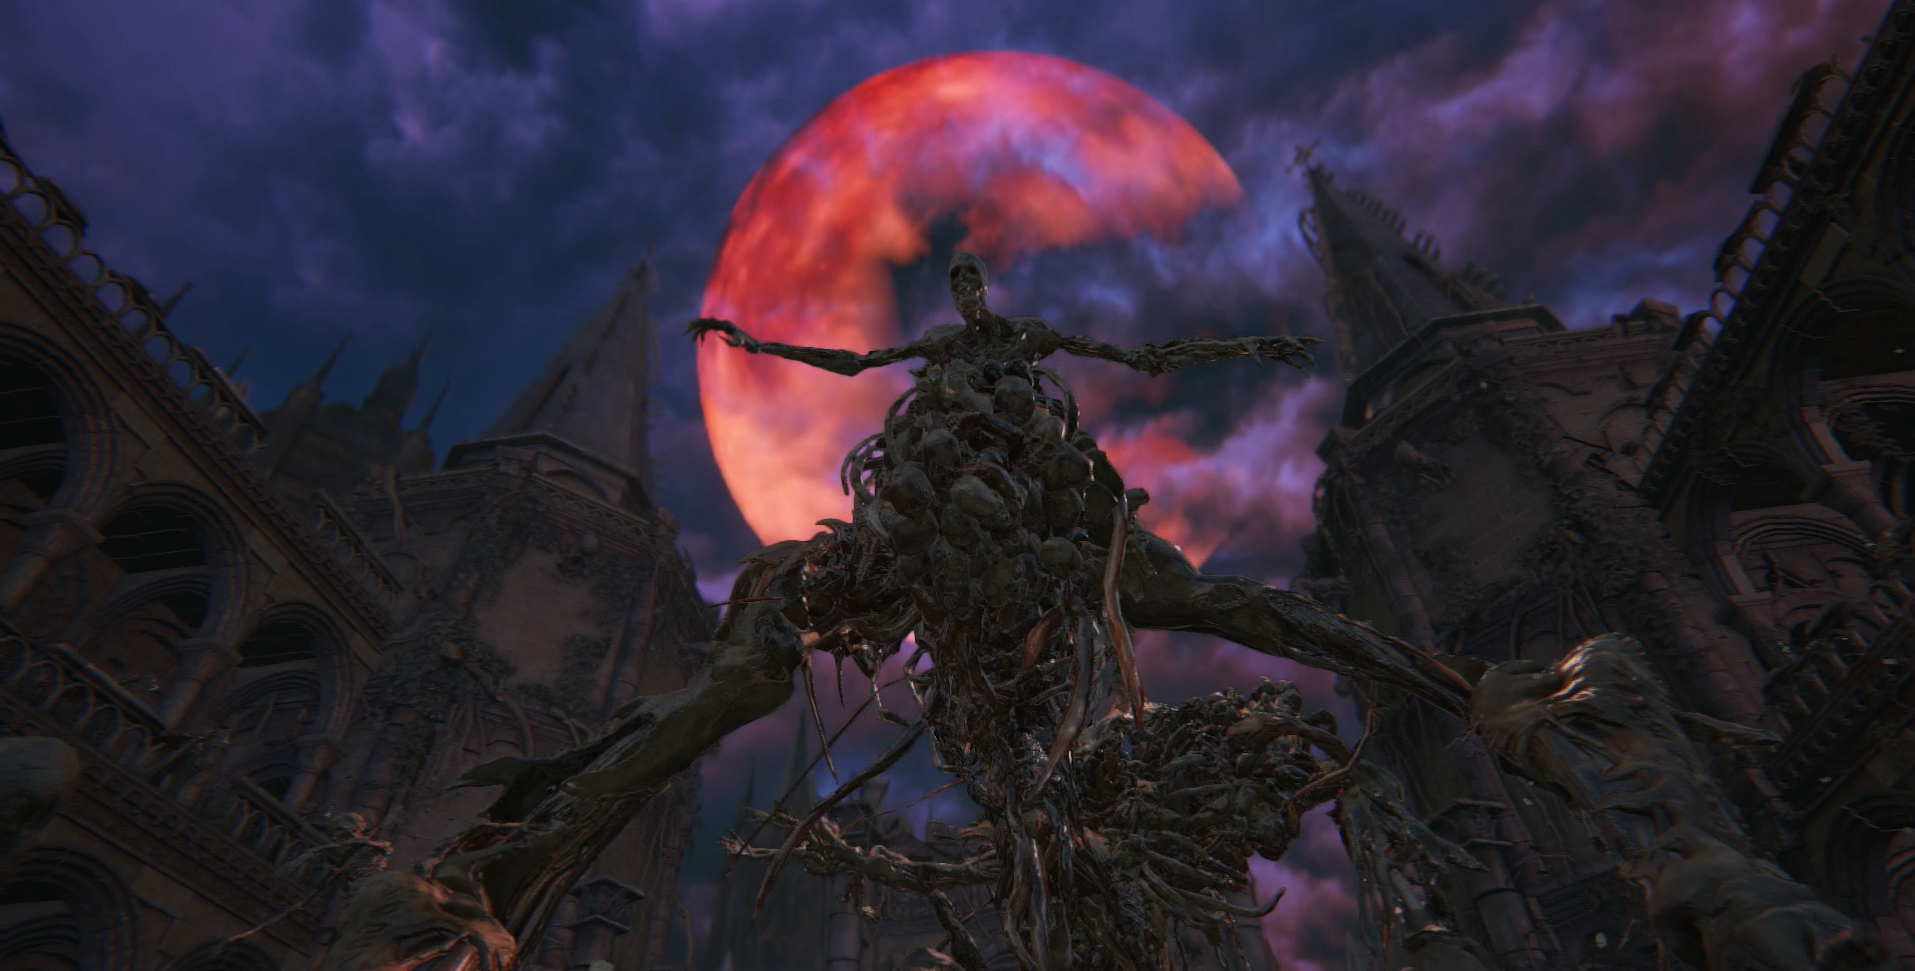 漁村 - Bloodborne wiki